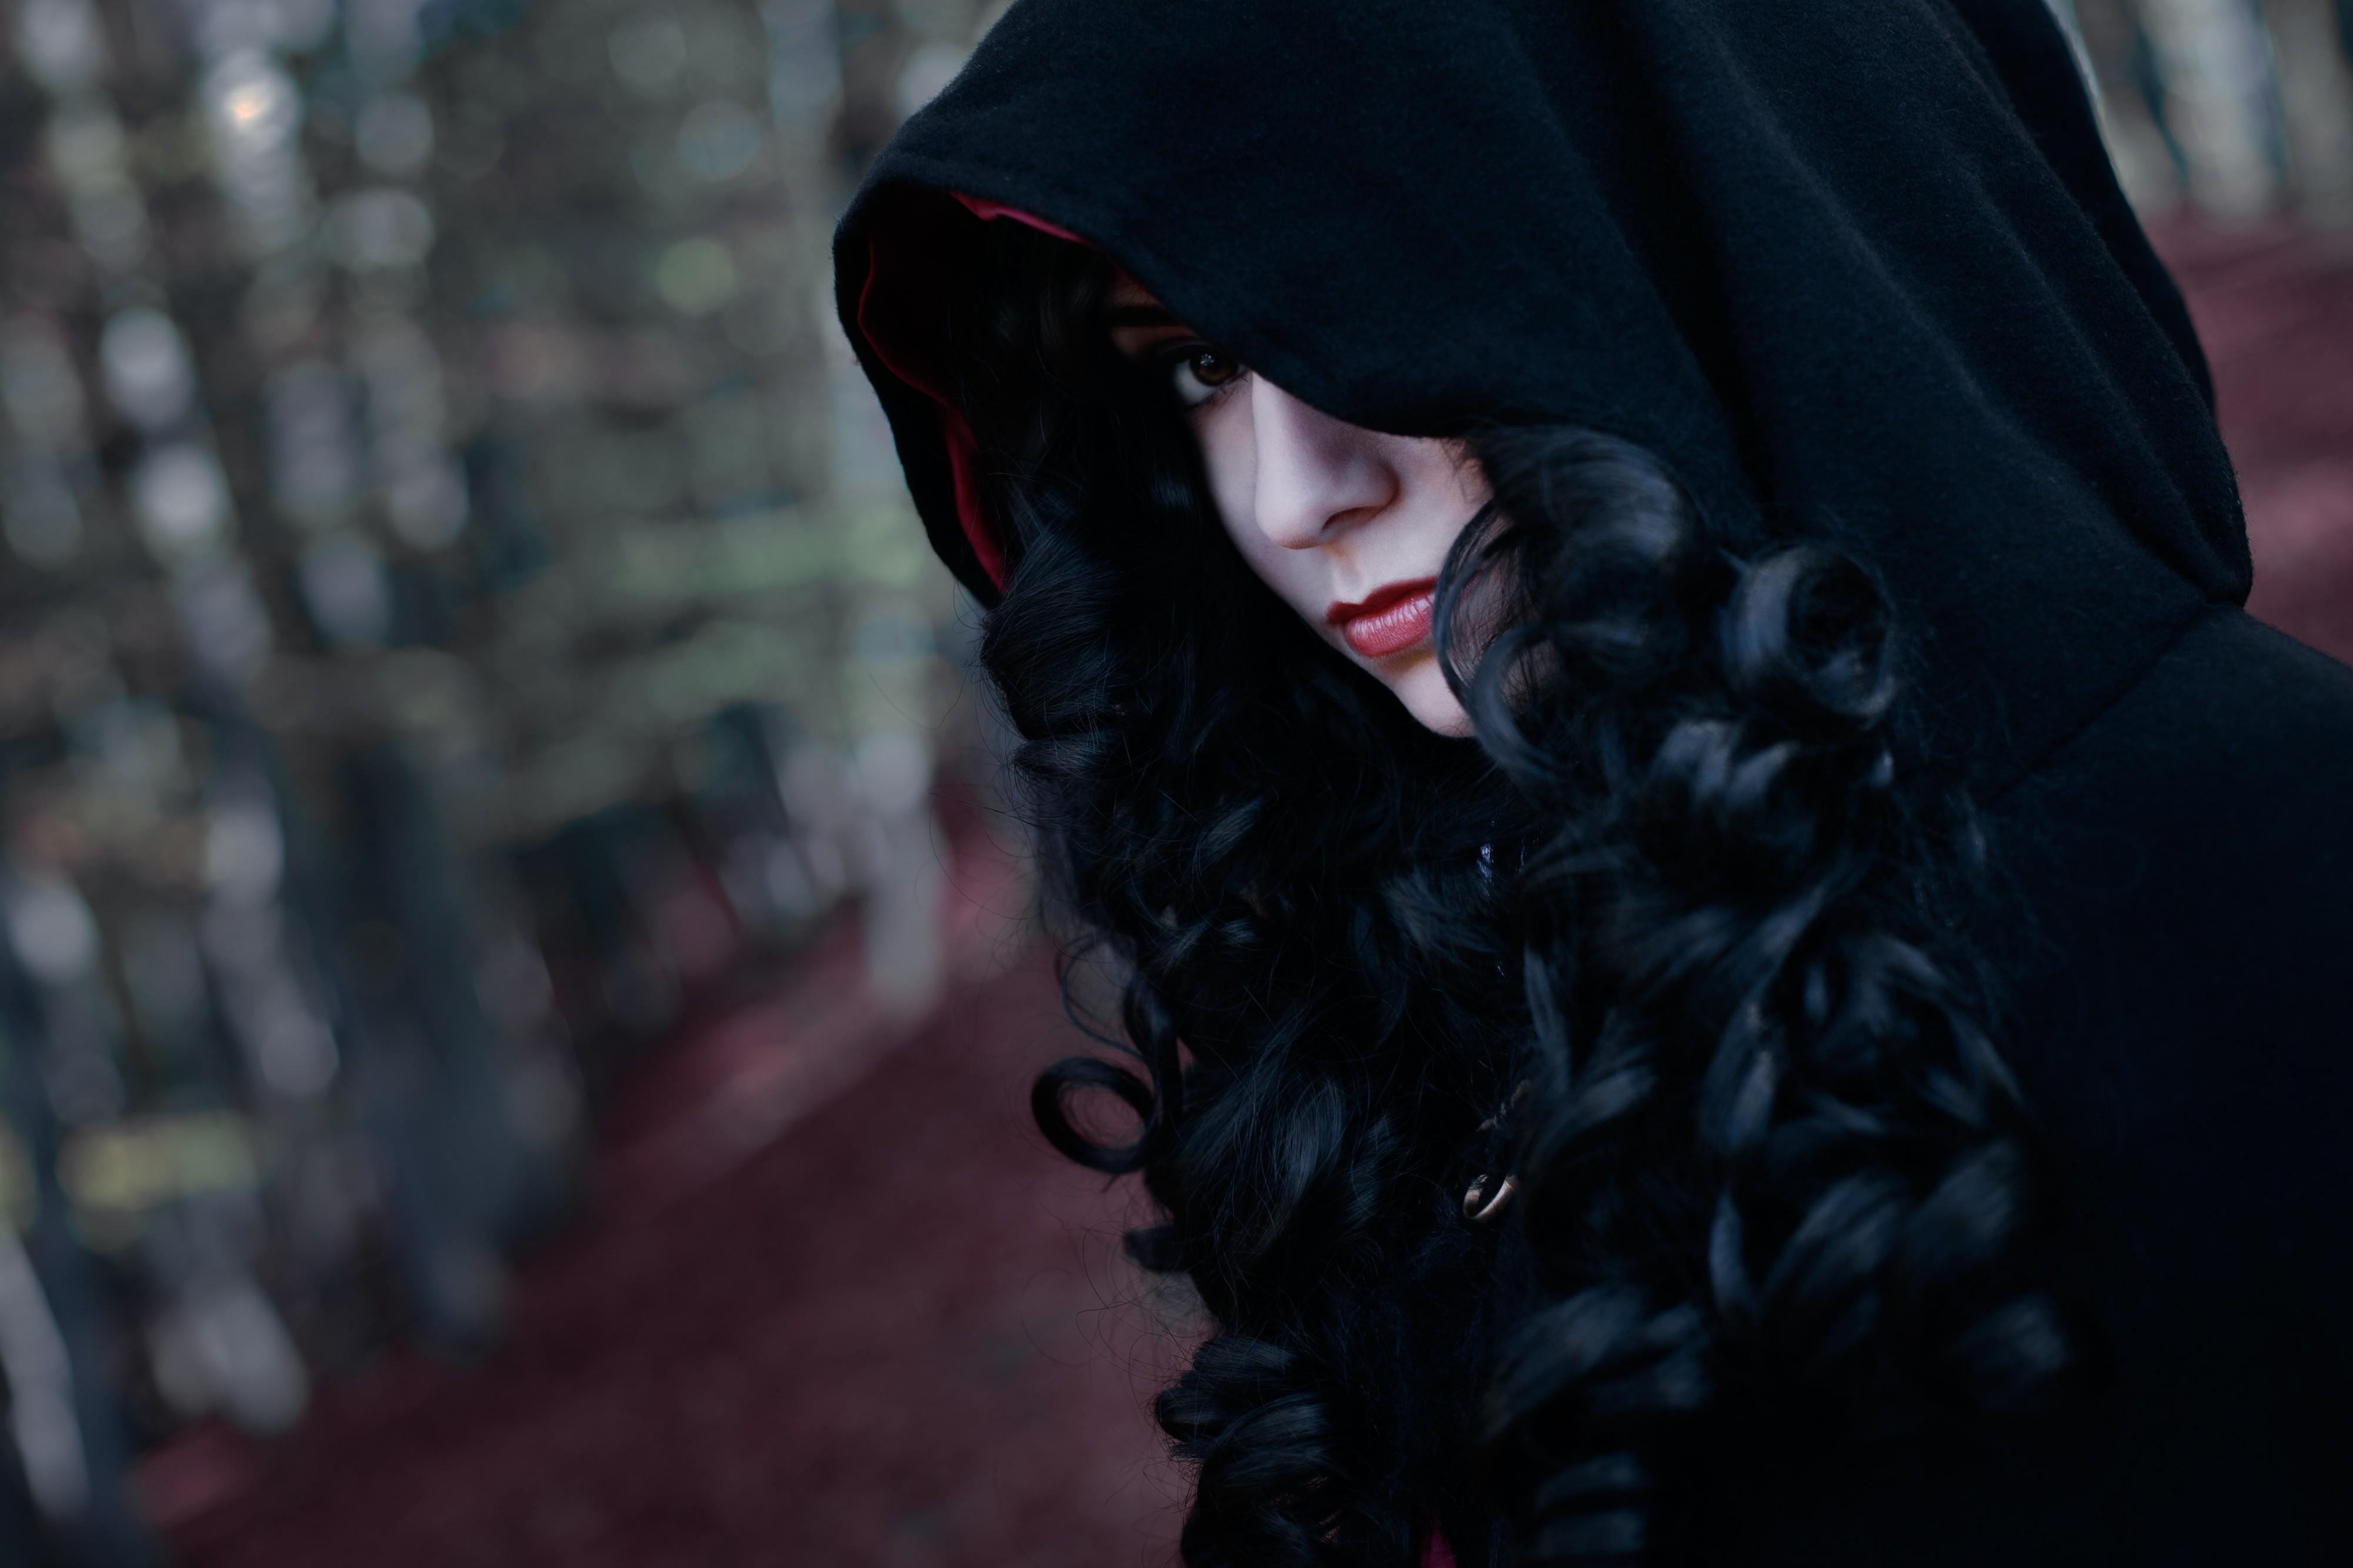 Wallpaper Women Cosplay Portrait Brunette Hoods Black Hair Curly Hair Fashion The Witcher 3 Wild Hunt Yennefer Of Vengerberg Darkness 4000x2666 Maharaj 54473 Hd Wallpapers Wallhere